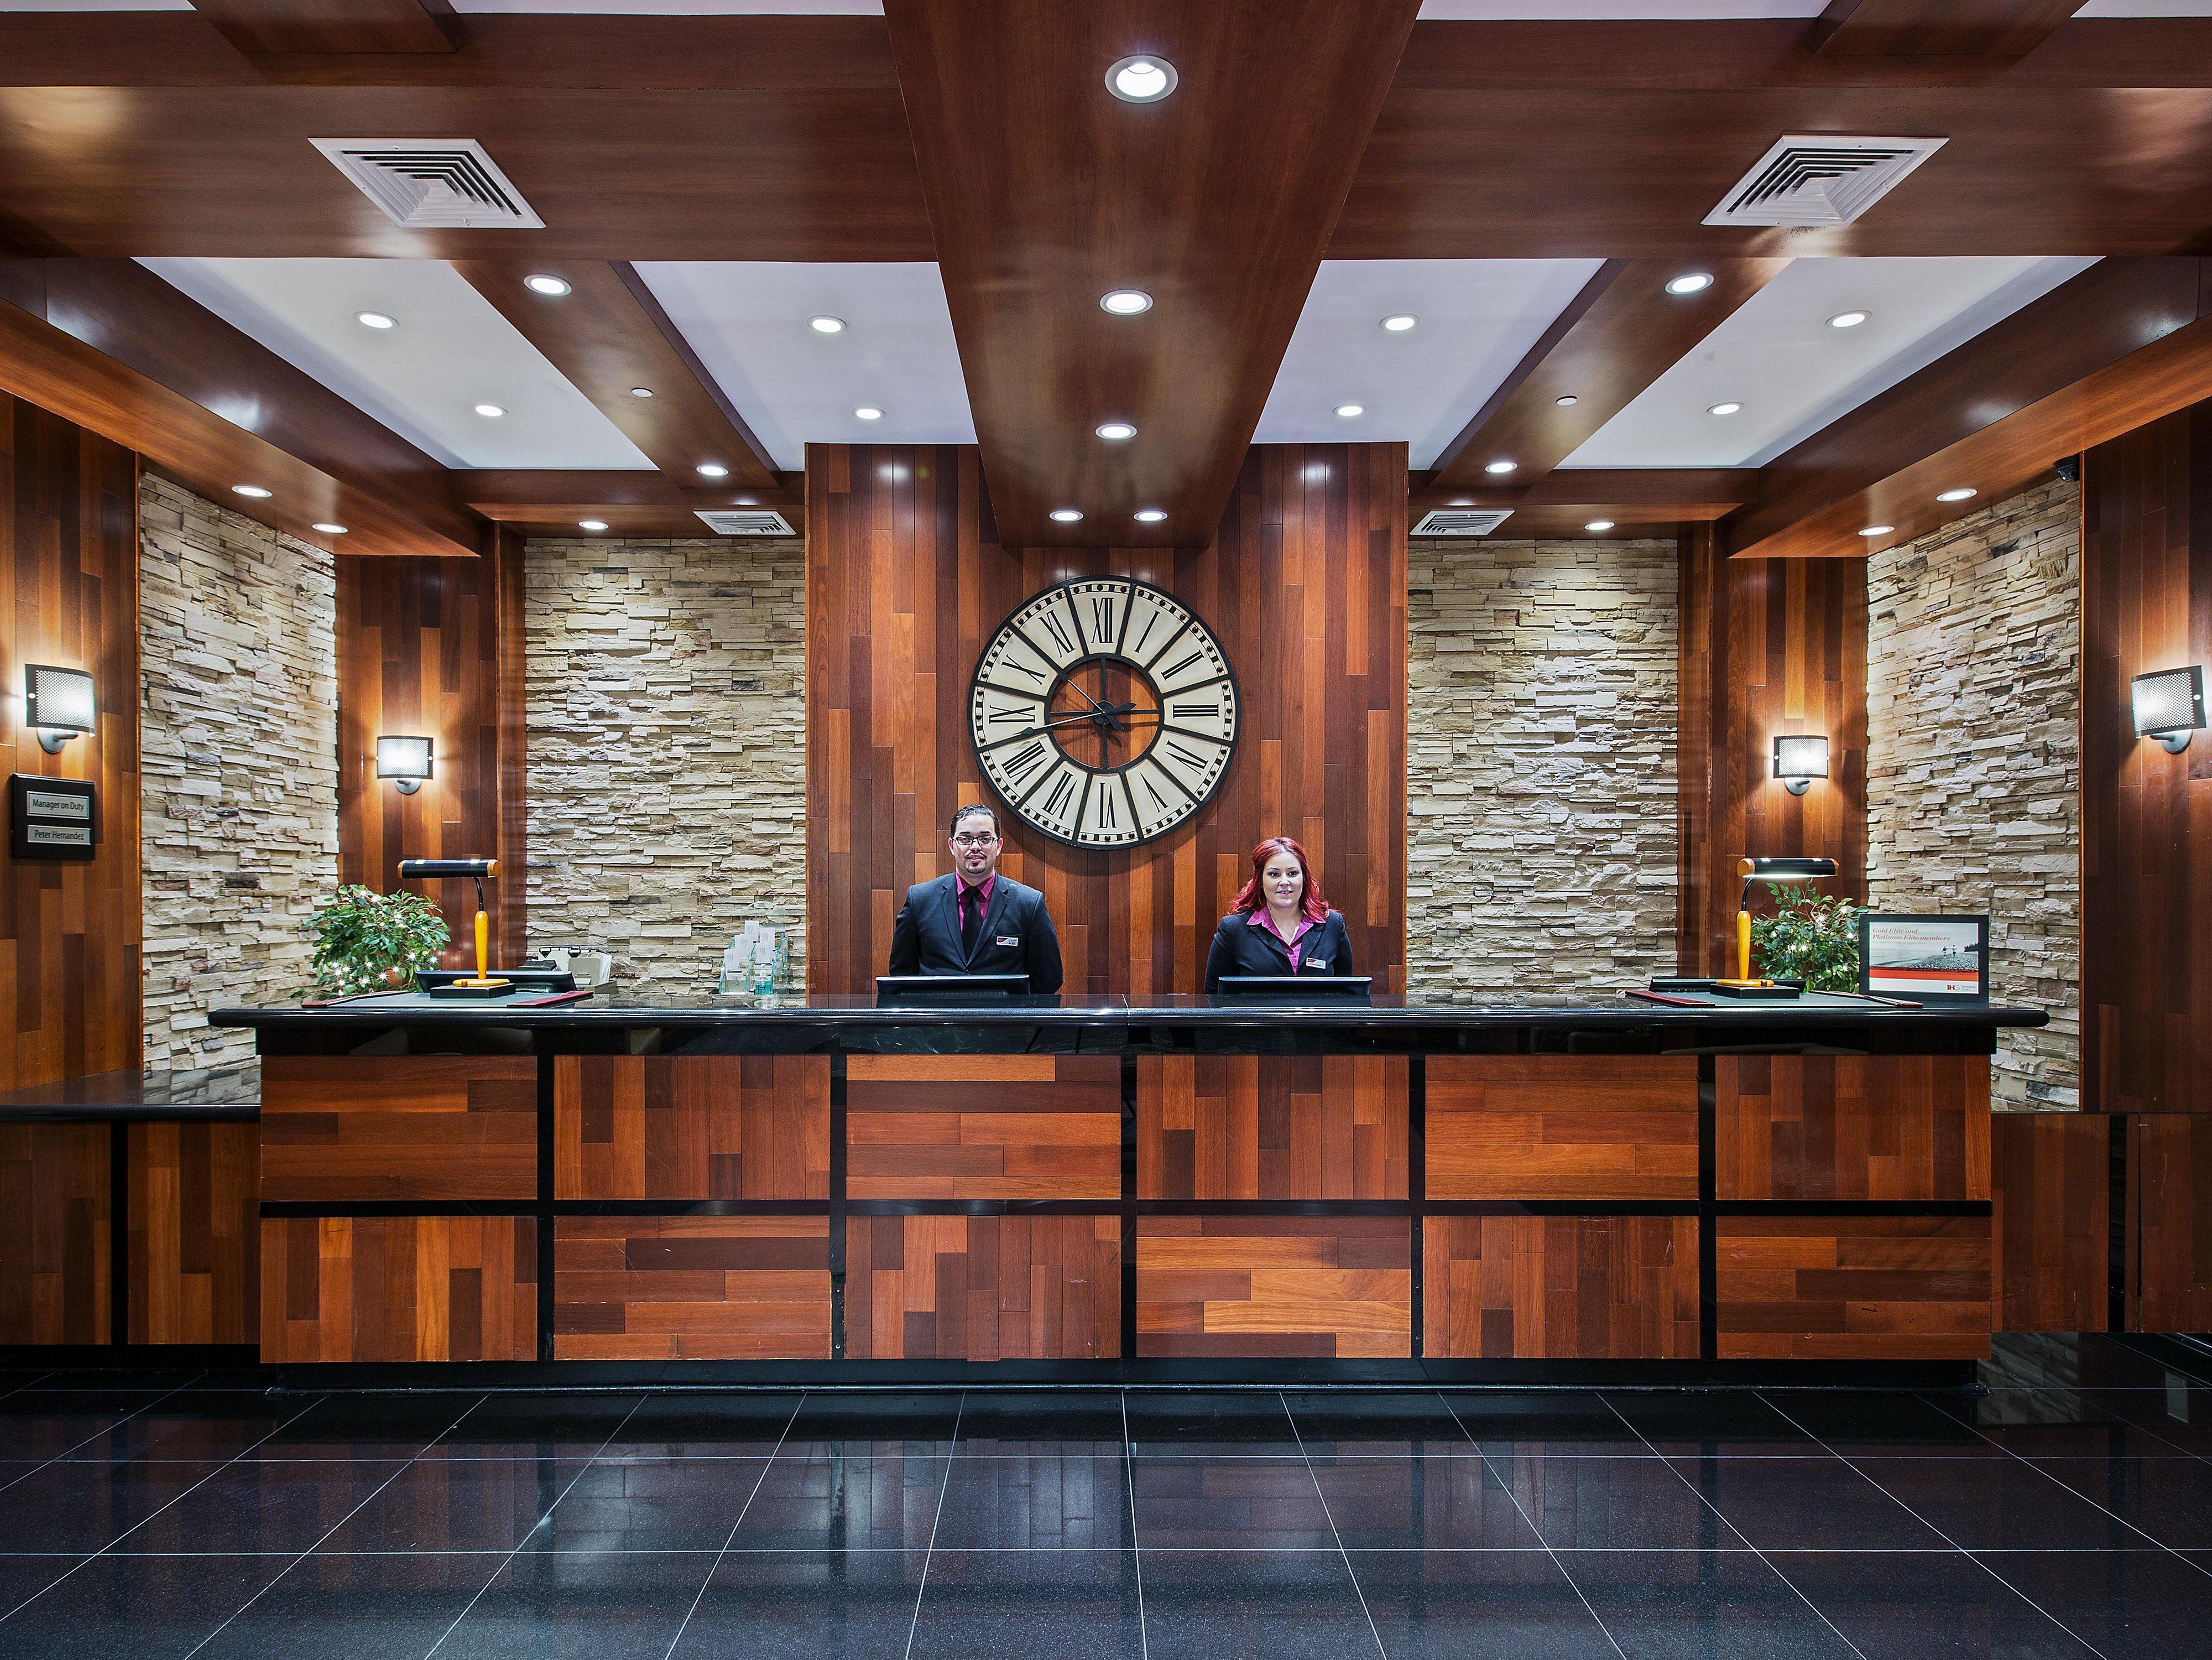 Newark Airport Hotels In Elizabeth Nj With Indoor Pools Crowne Plaza Newark Airport